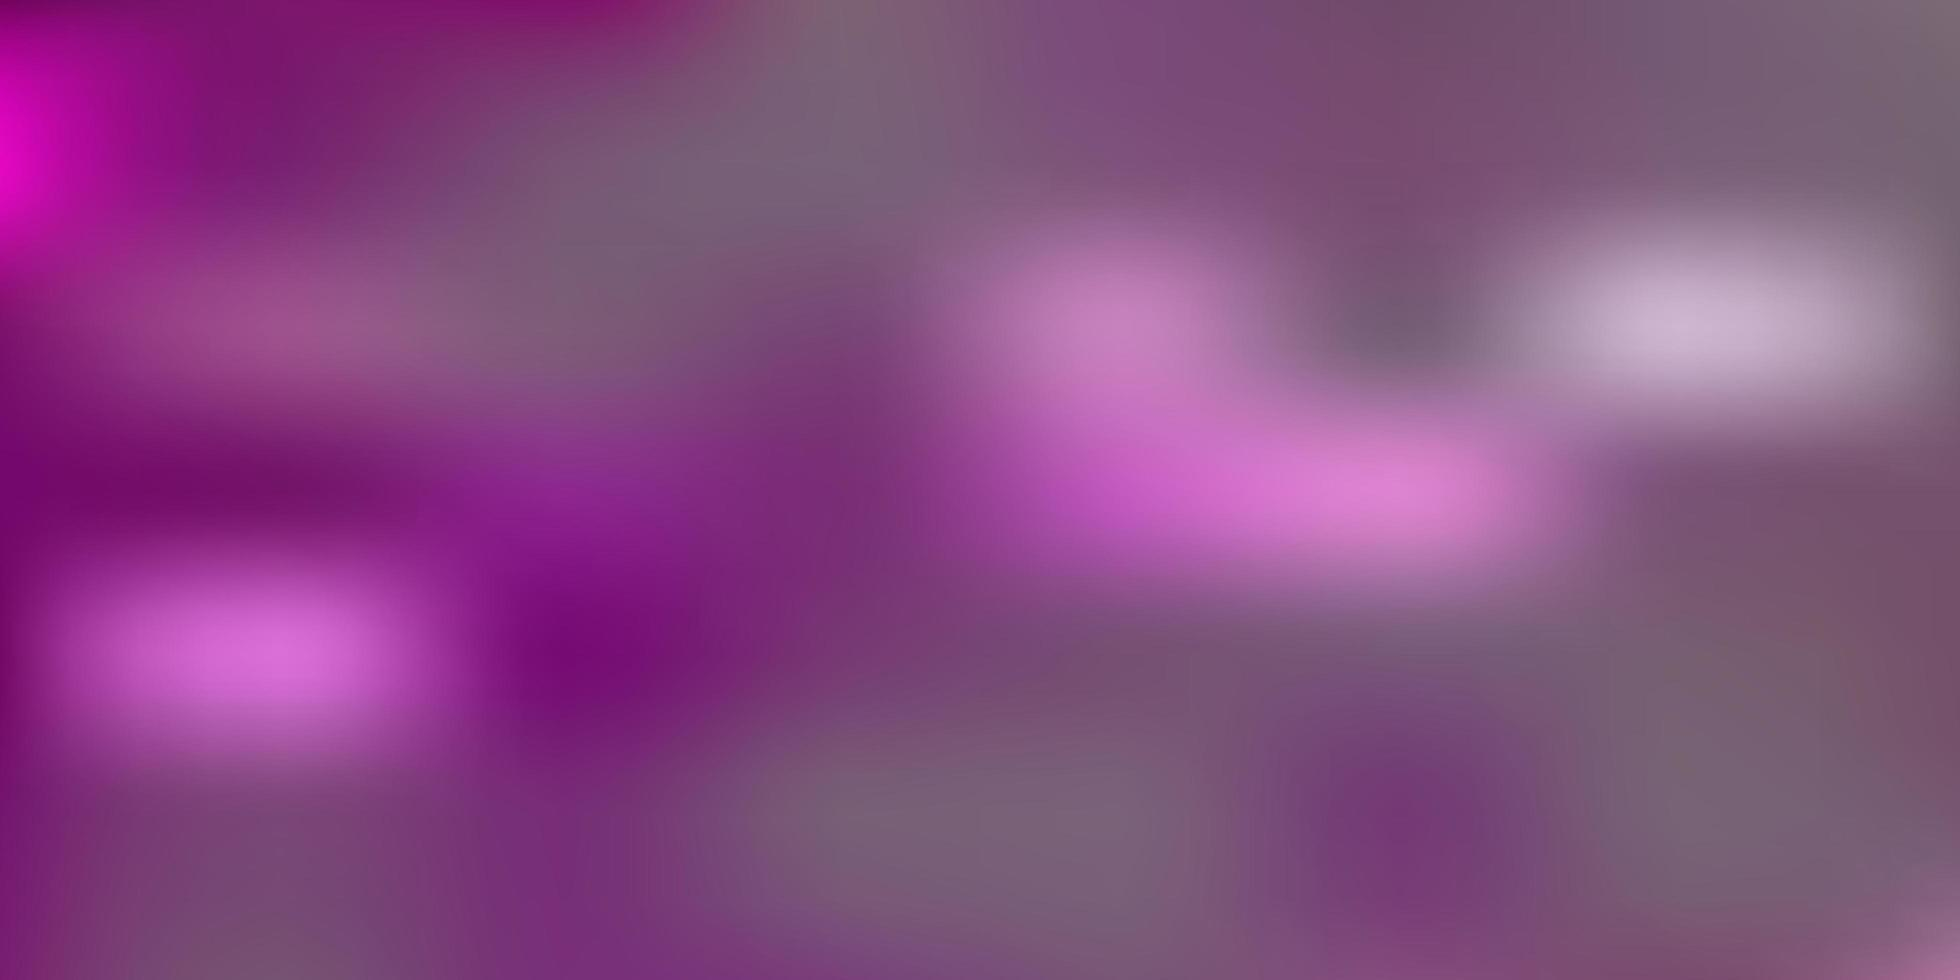 ljusrosa, gul vektor oskärpa layout.